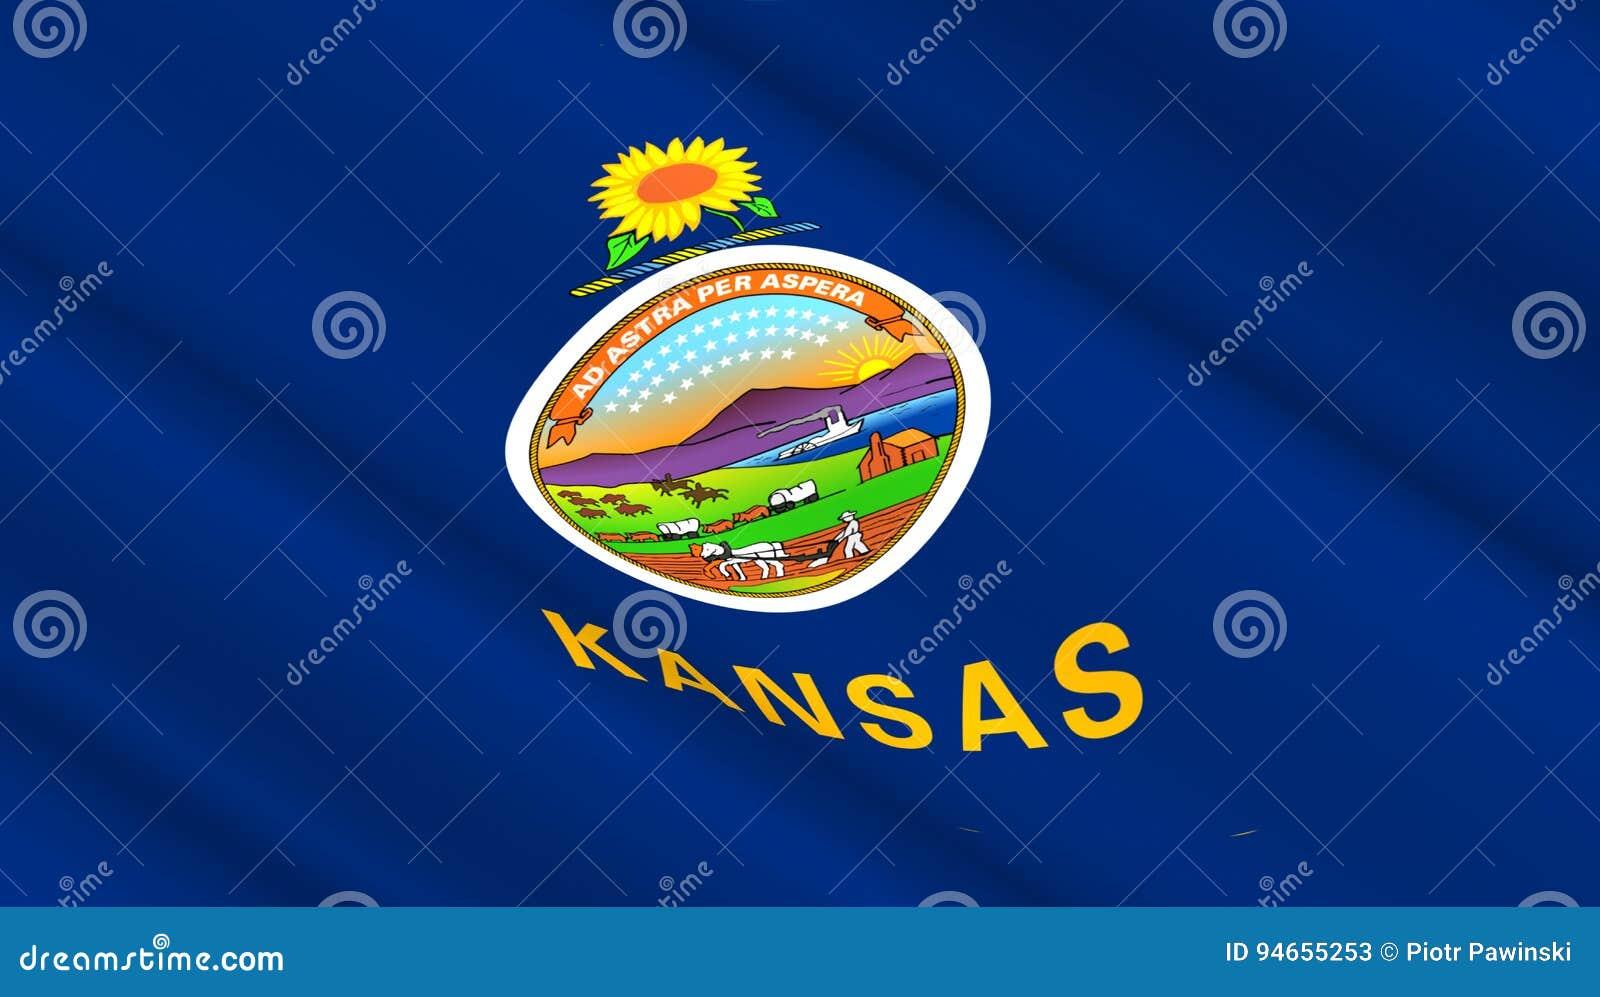 flag of kansas state stock illustration illustration of proud